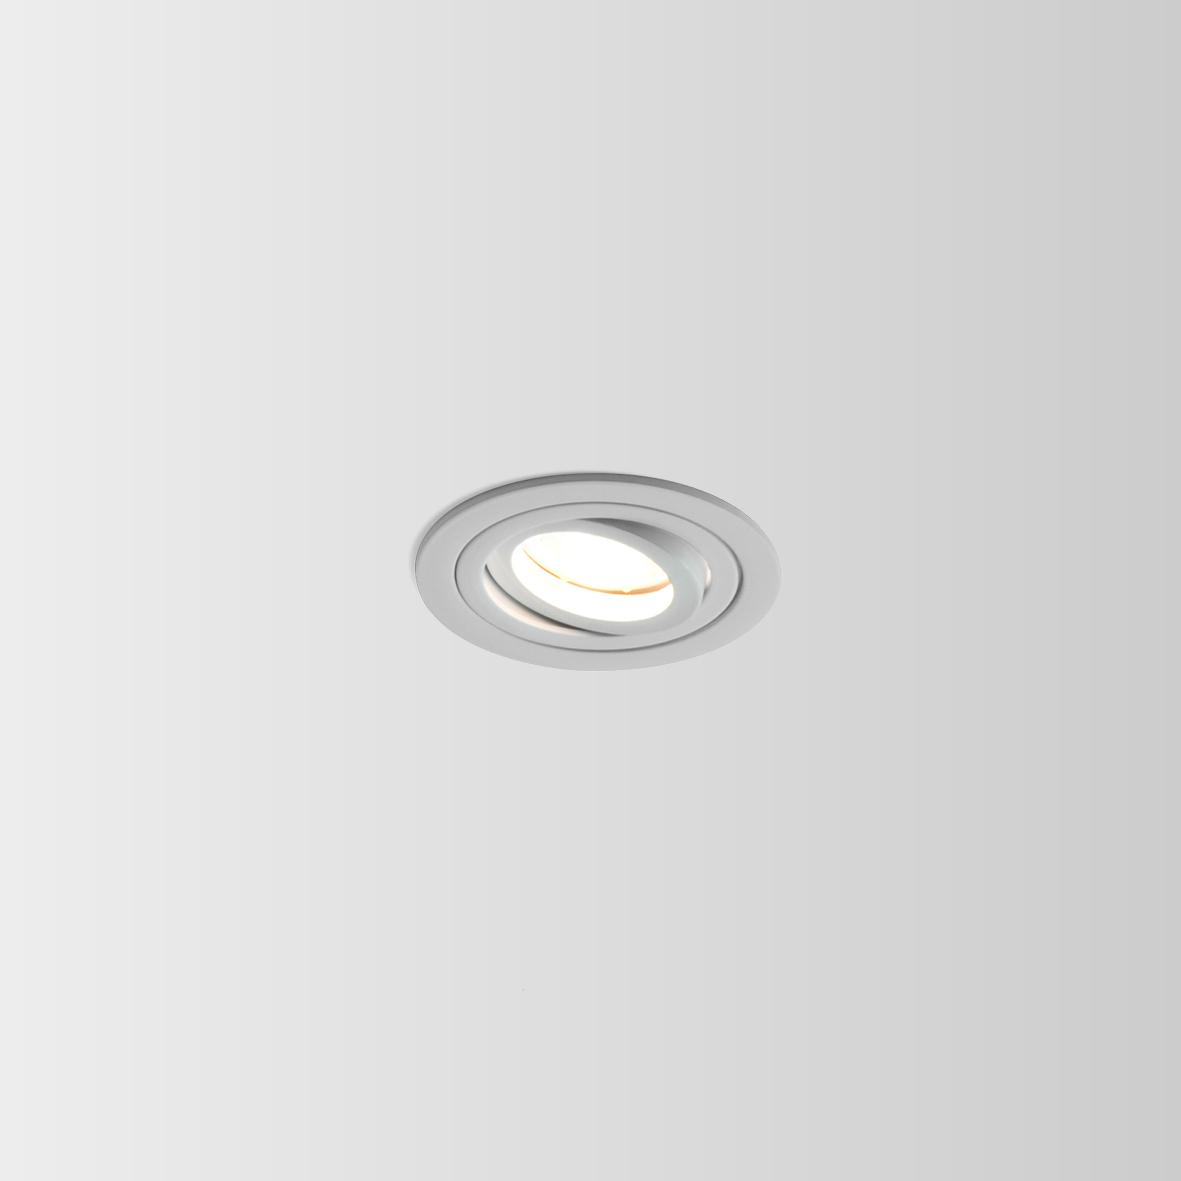 Wever & Ducré+SPINO 1.0 MR16 MATT KROOM MAX 50W GU5.3 12V